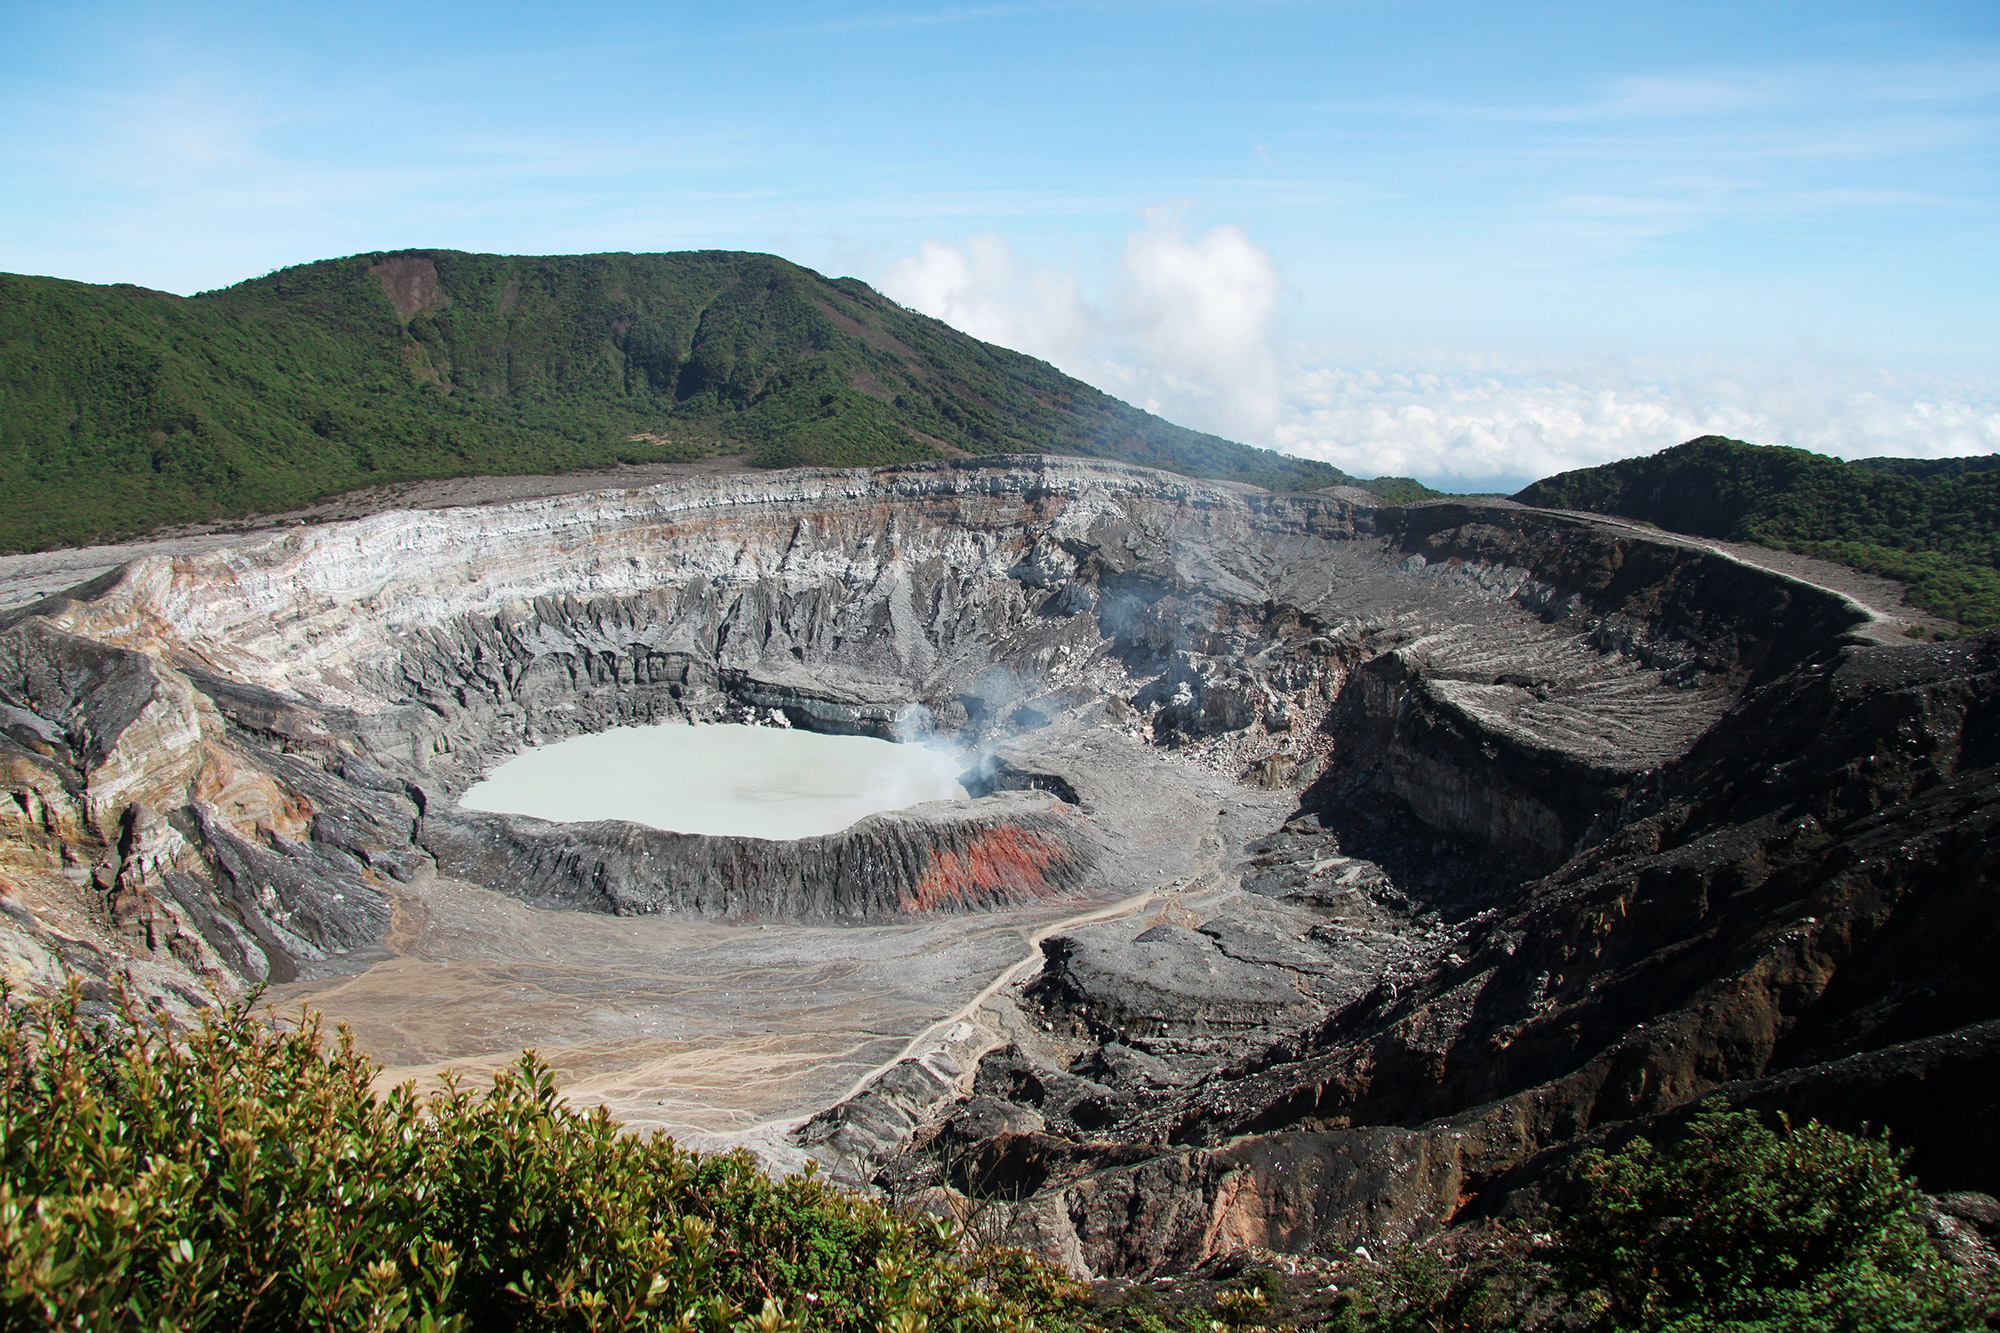 Onze favoriete nationale parken van Costa Rica - Parque Nacional Volcán Poás